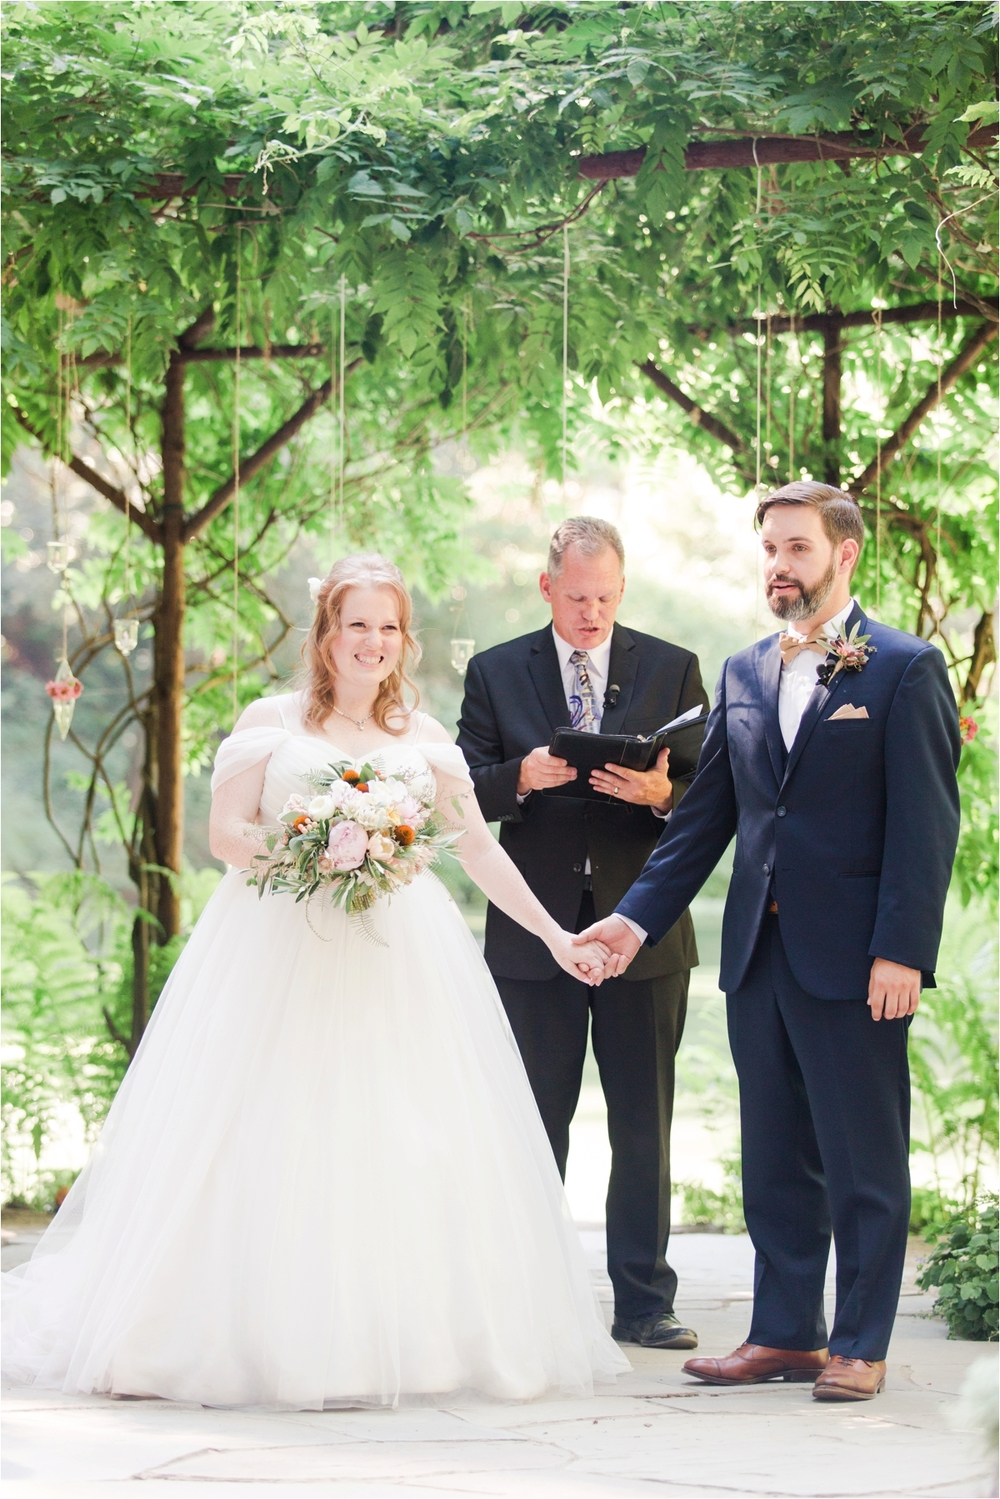 Nestldown wedding Photos by Briana Calderon Photography_0160.jpg